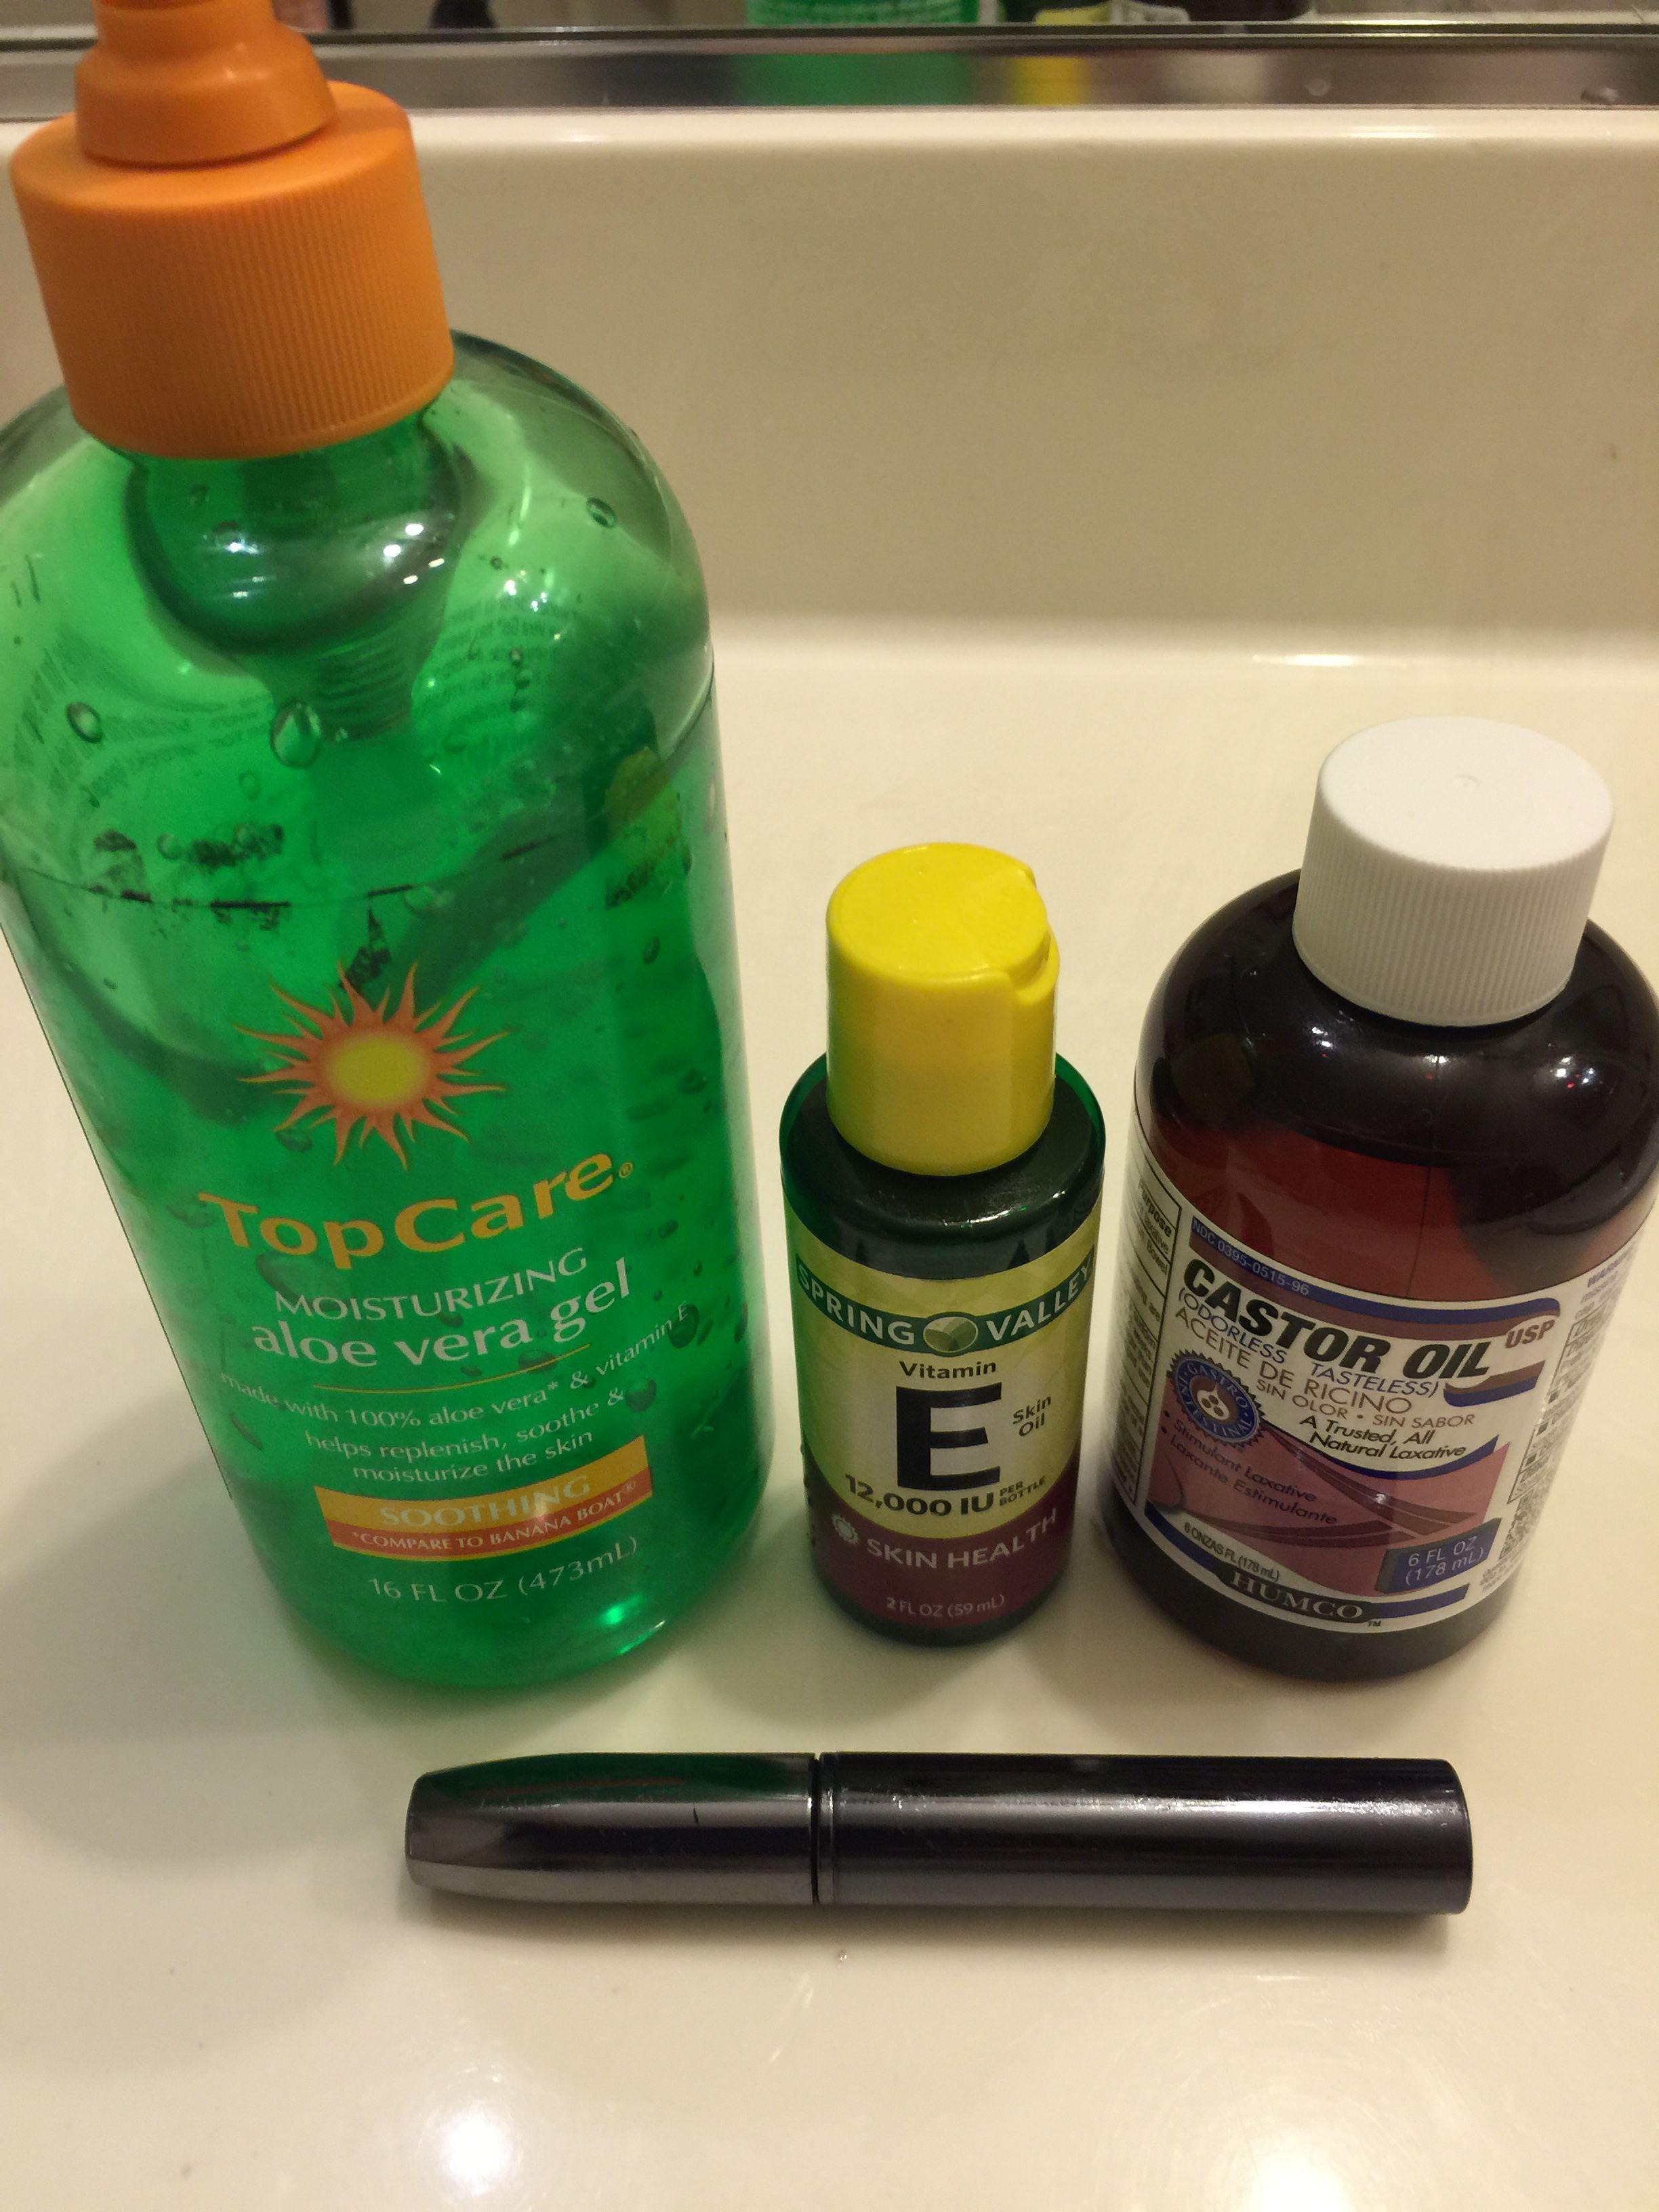 Diy eyelashes serum makes longer and thicker lashes mix 1